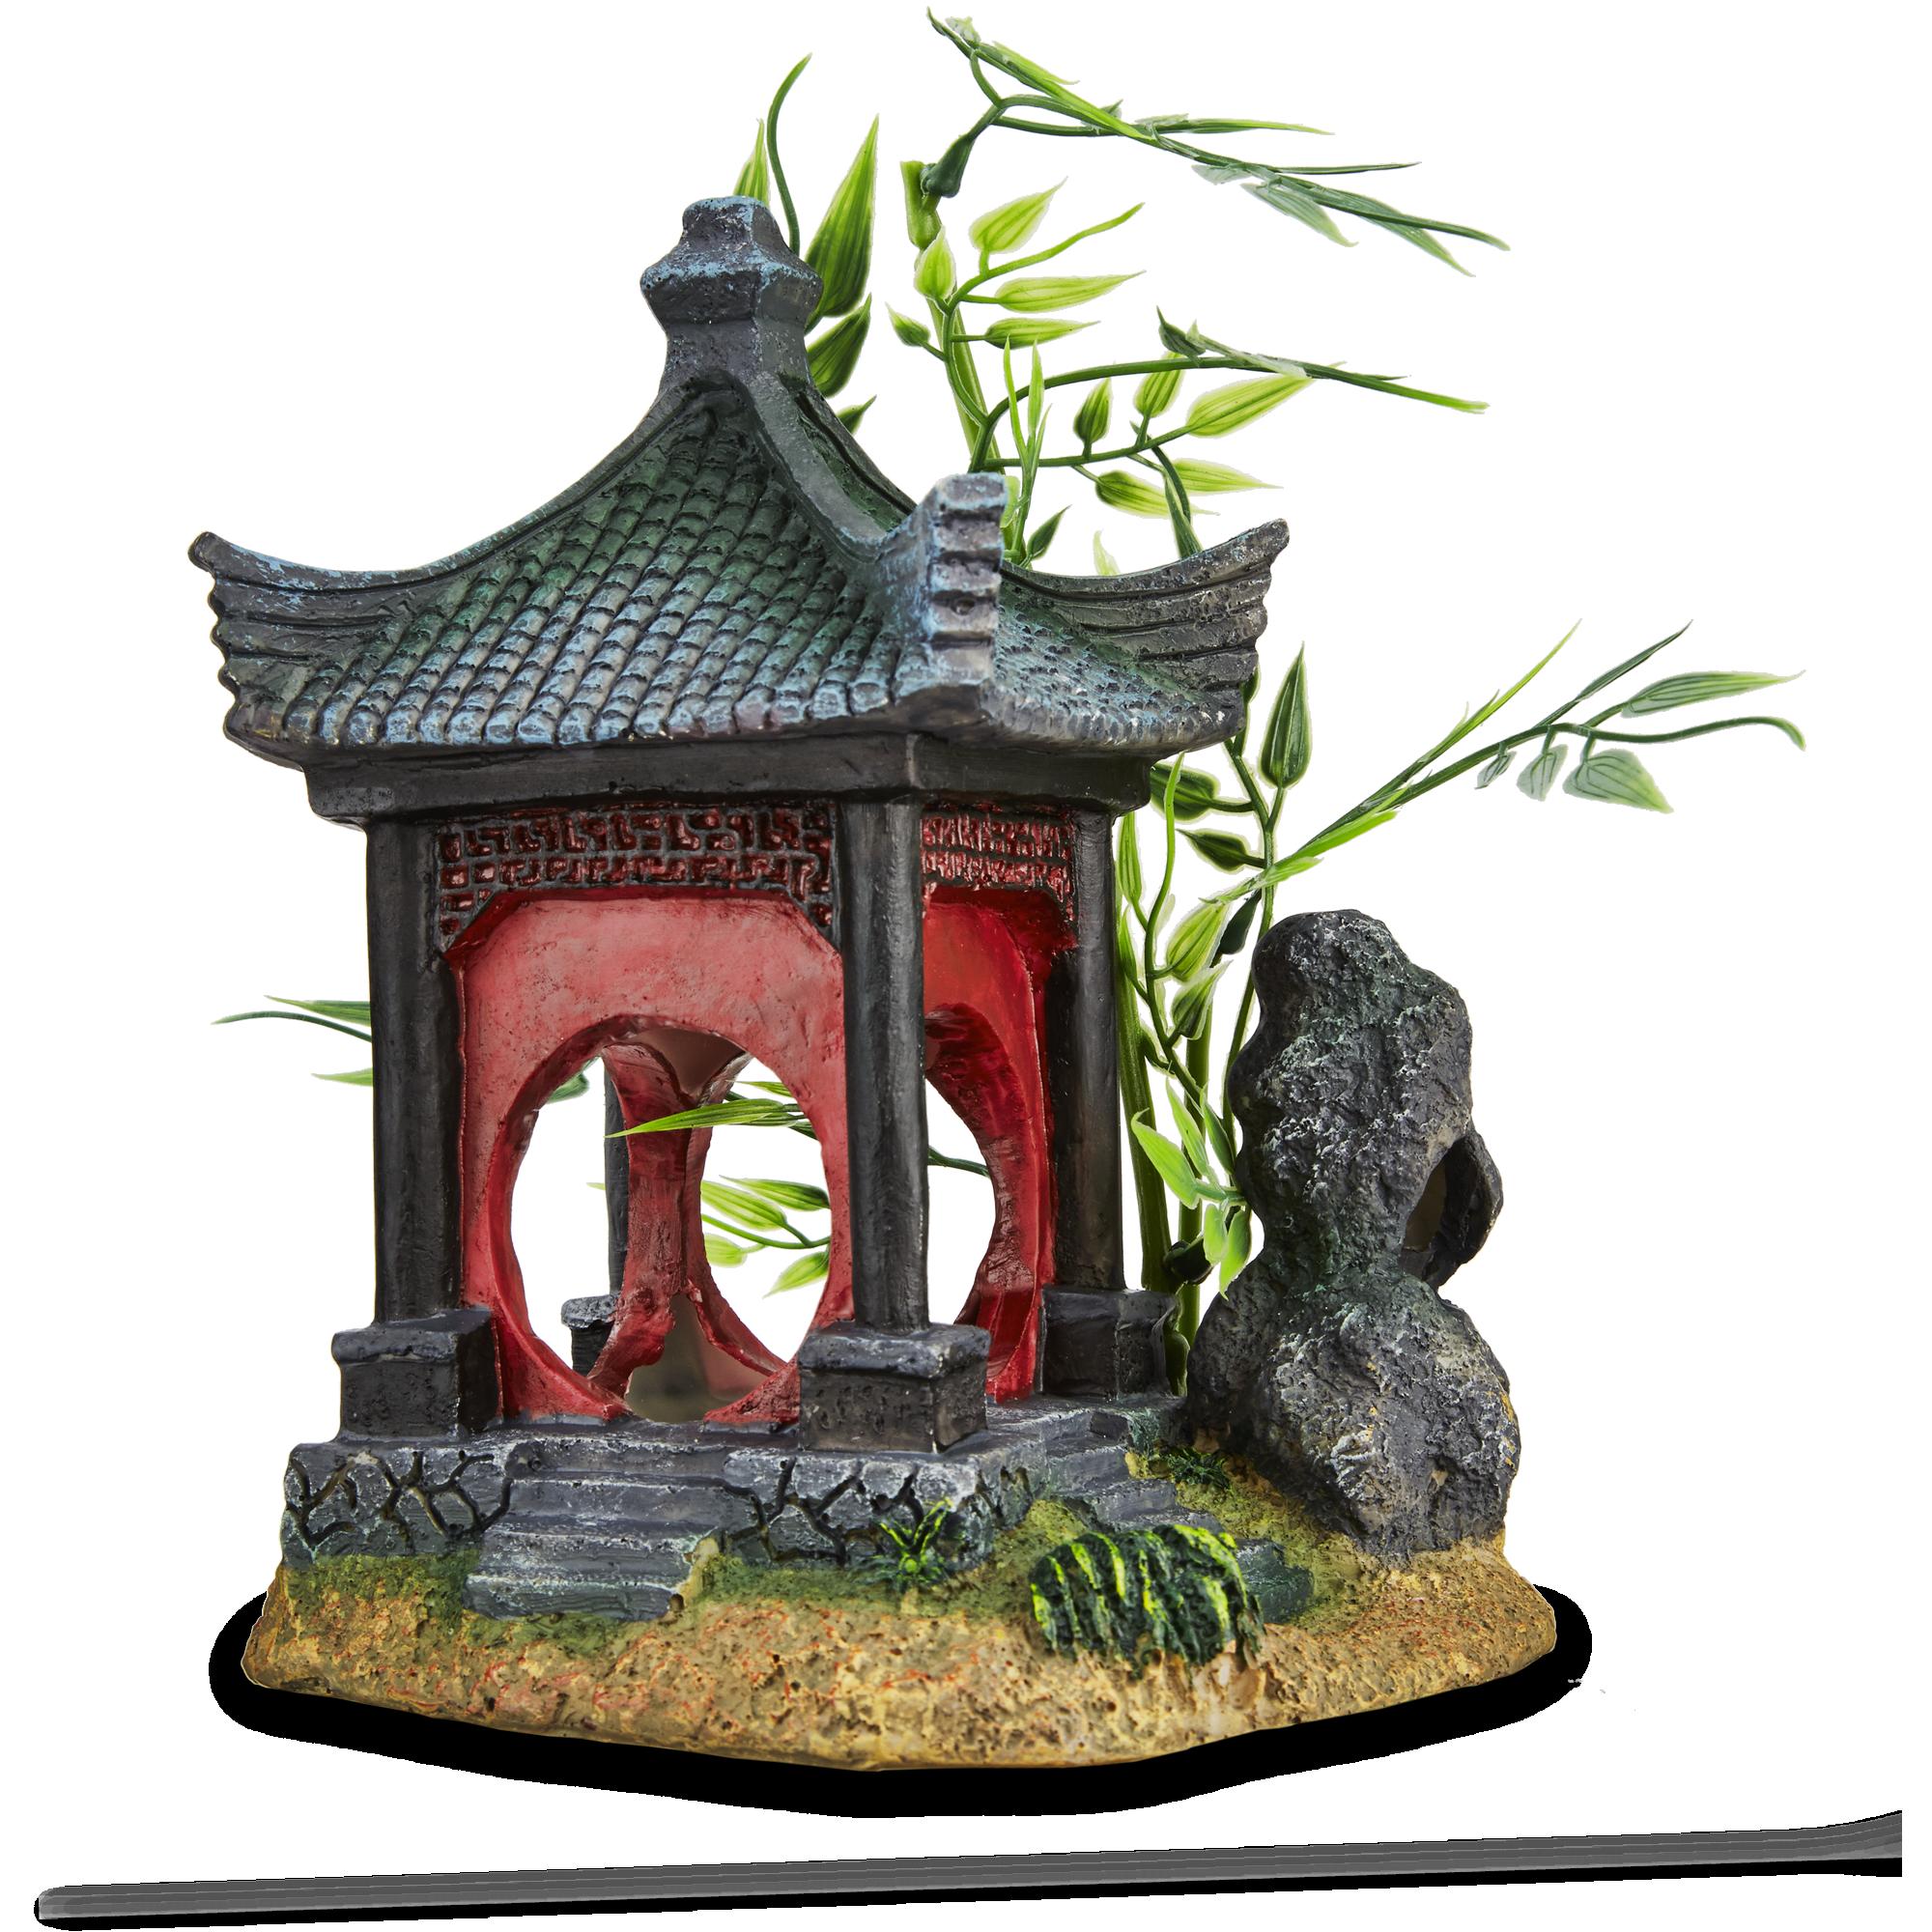 Imagitarium Asian Gazebo With Bamboo Ornament Petco Fish Tank Decorations Betta Fish Toys Fish Tank